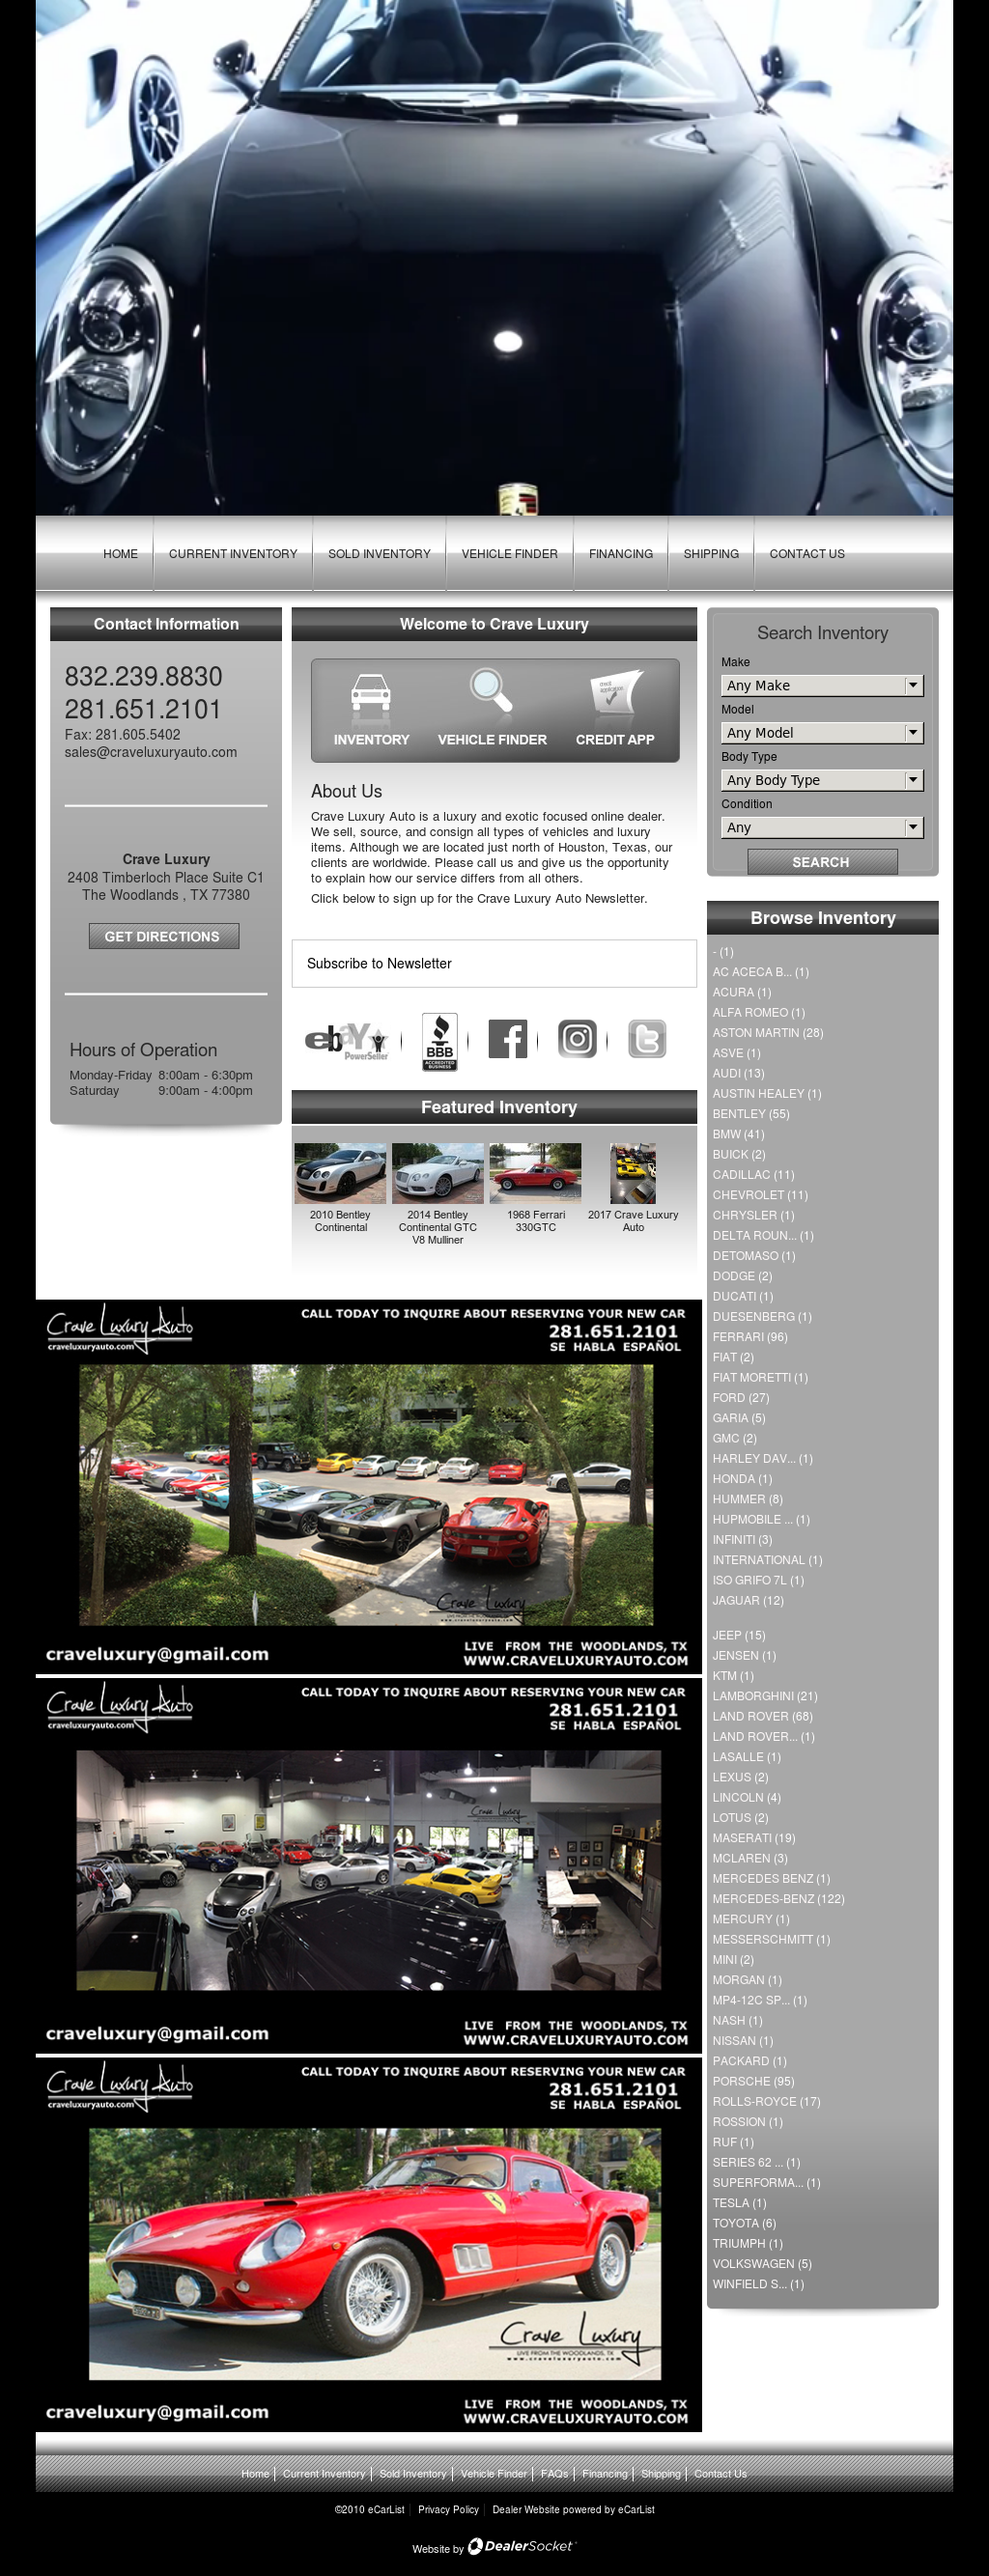 Crave Luxury Auto petitors Revenue and Employees Owler pany